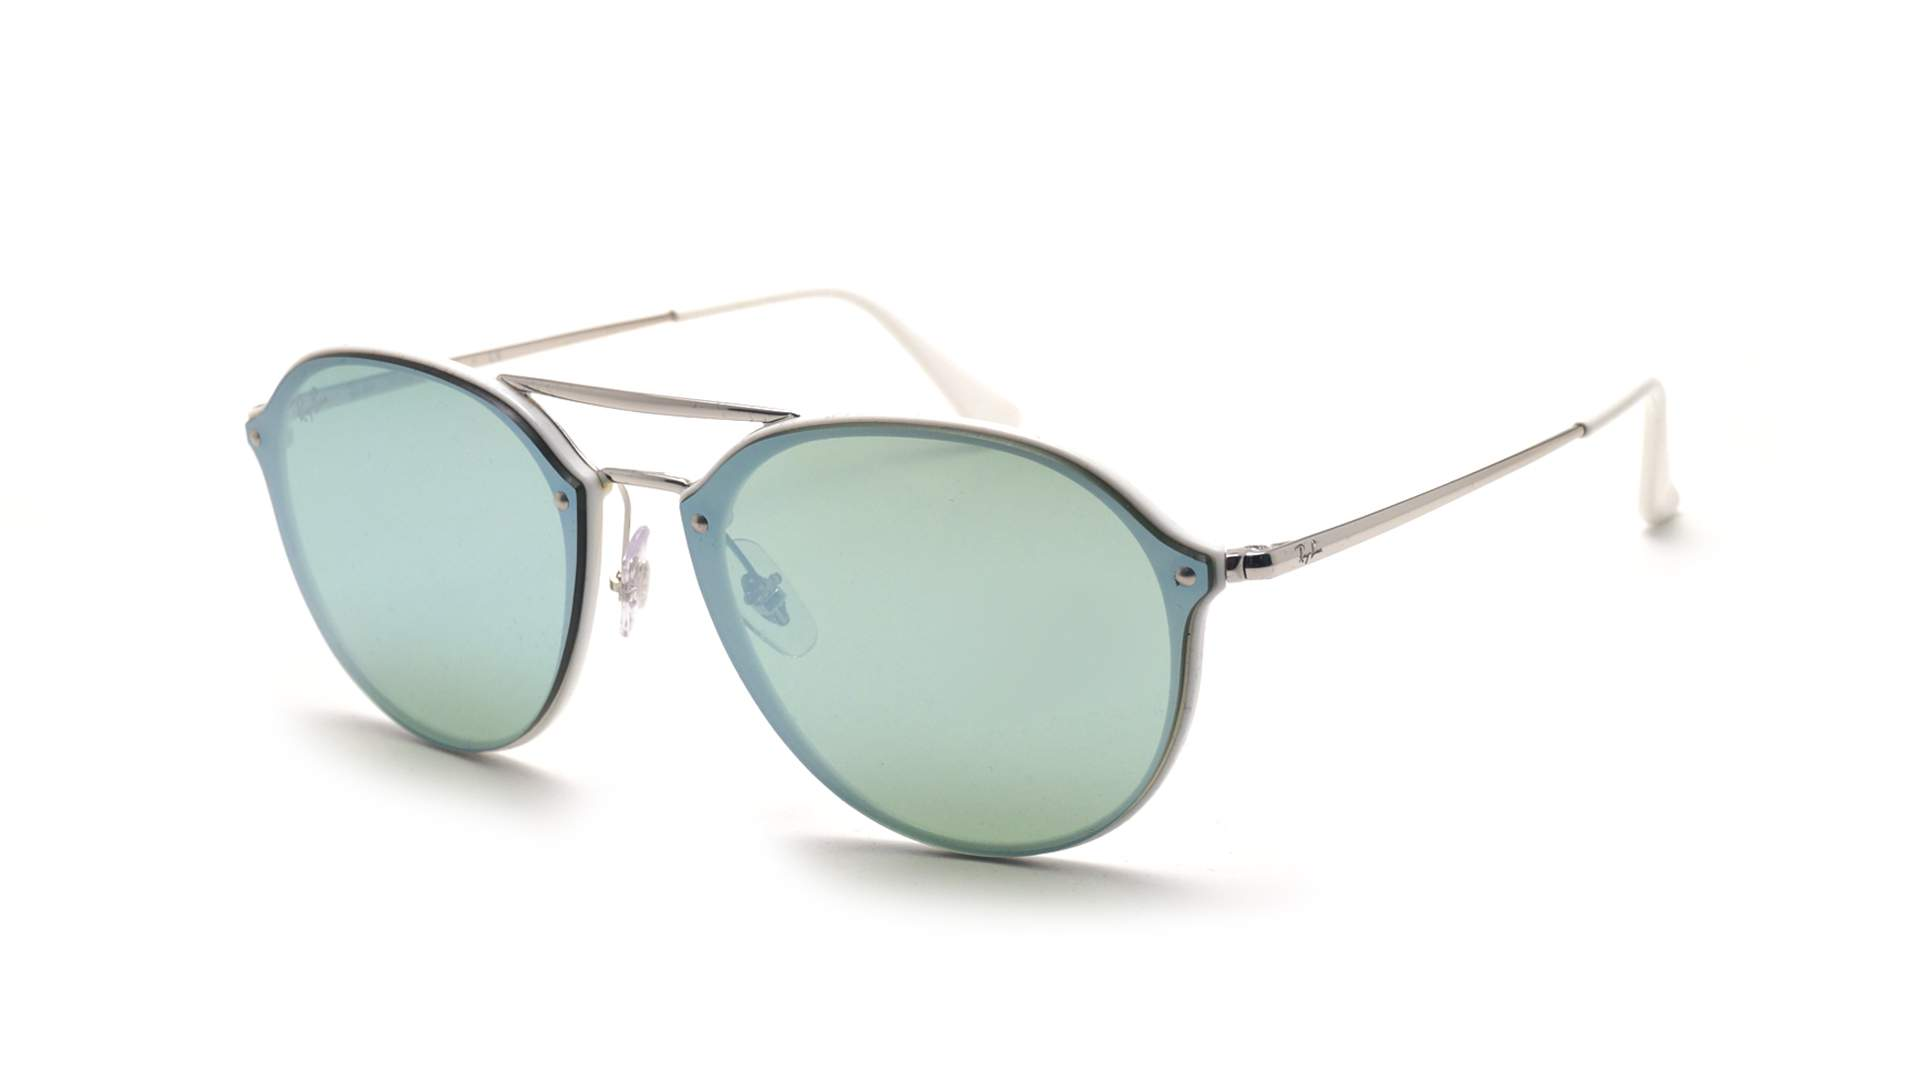 a51c9644ea Sunglasses Ray-Ban Blaze Double Bridge Silver RB4292N 671 30 62-14 Large  Mirror